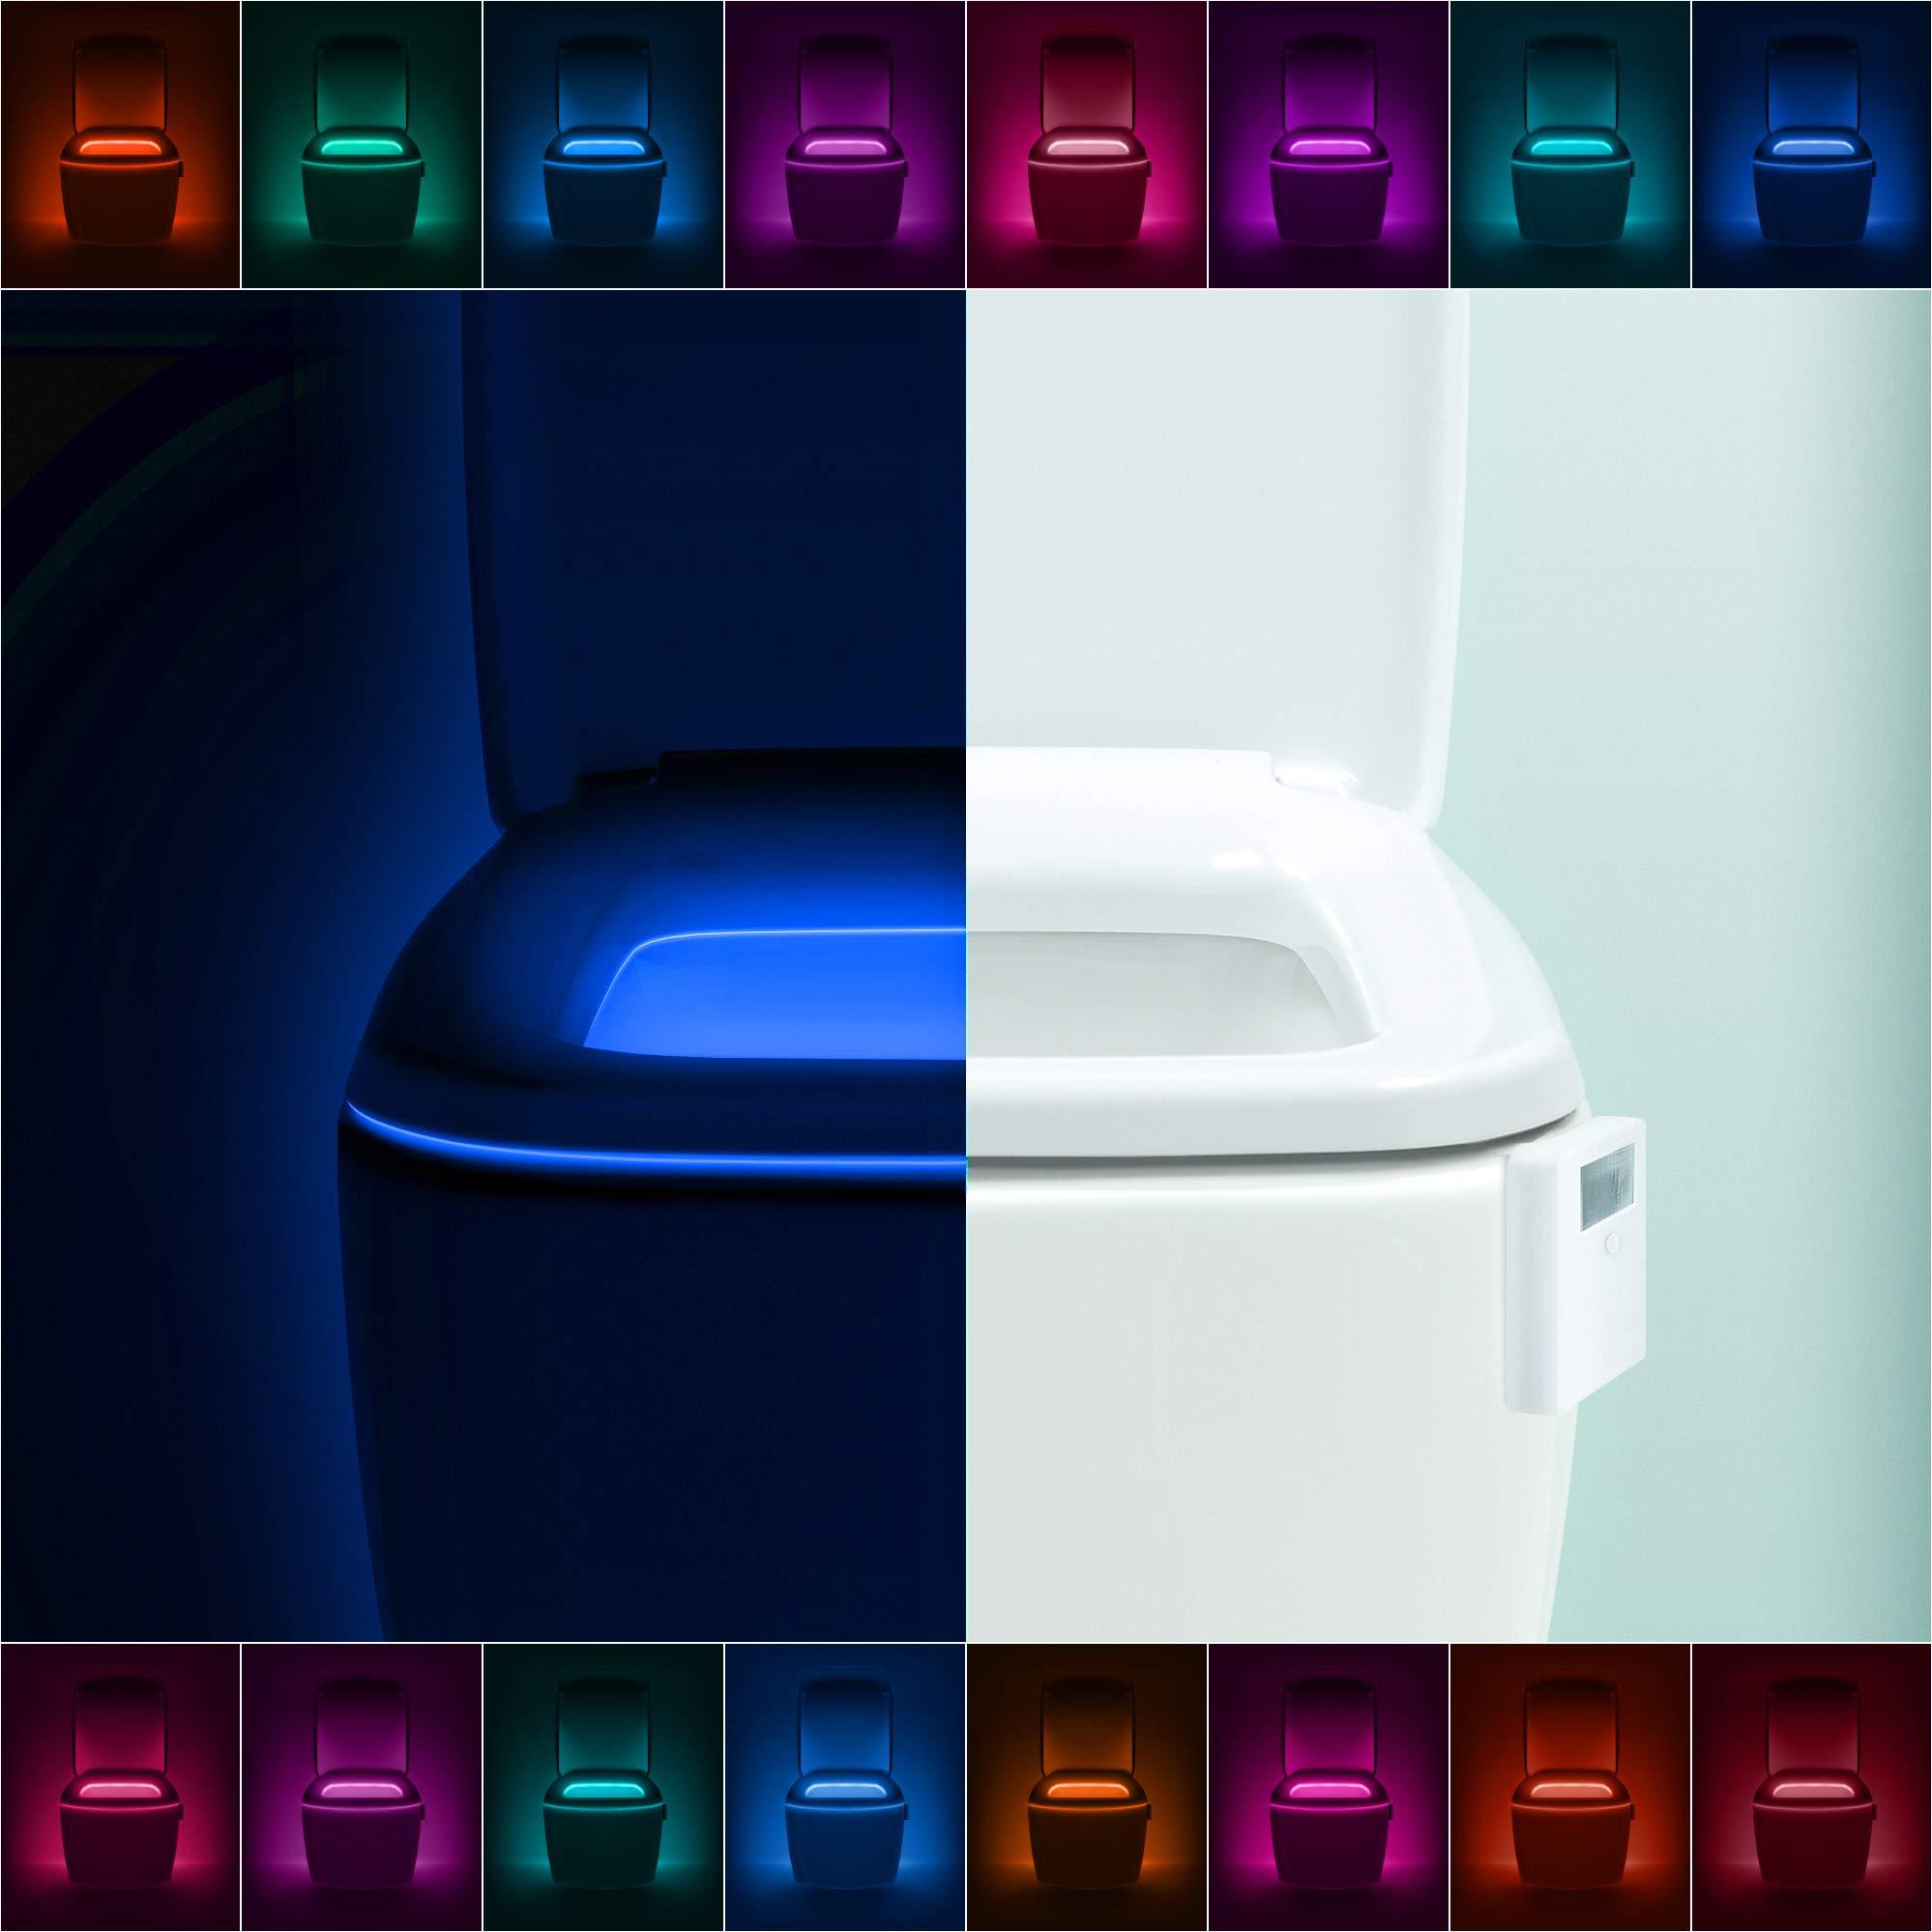 LumiLux Advanced 16-Color Motion Sensor LED Toilet Bowl Night Light, Internal Memory, Light Detection